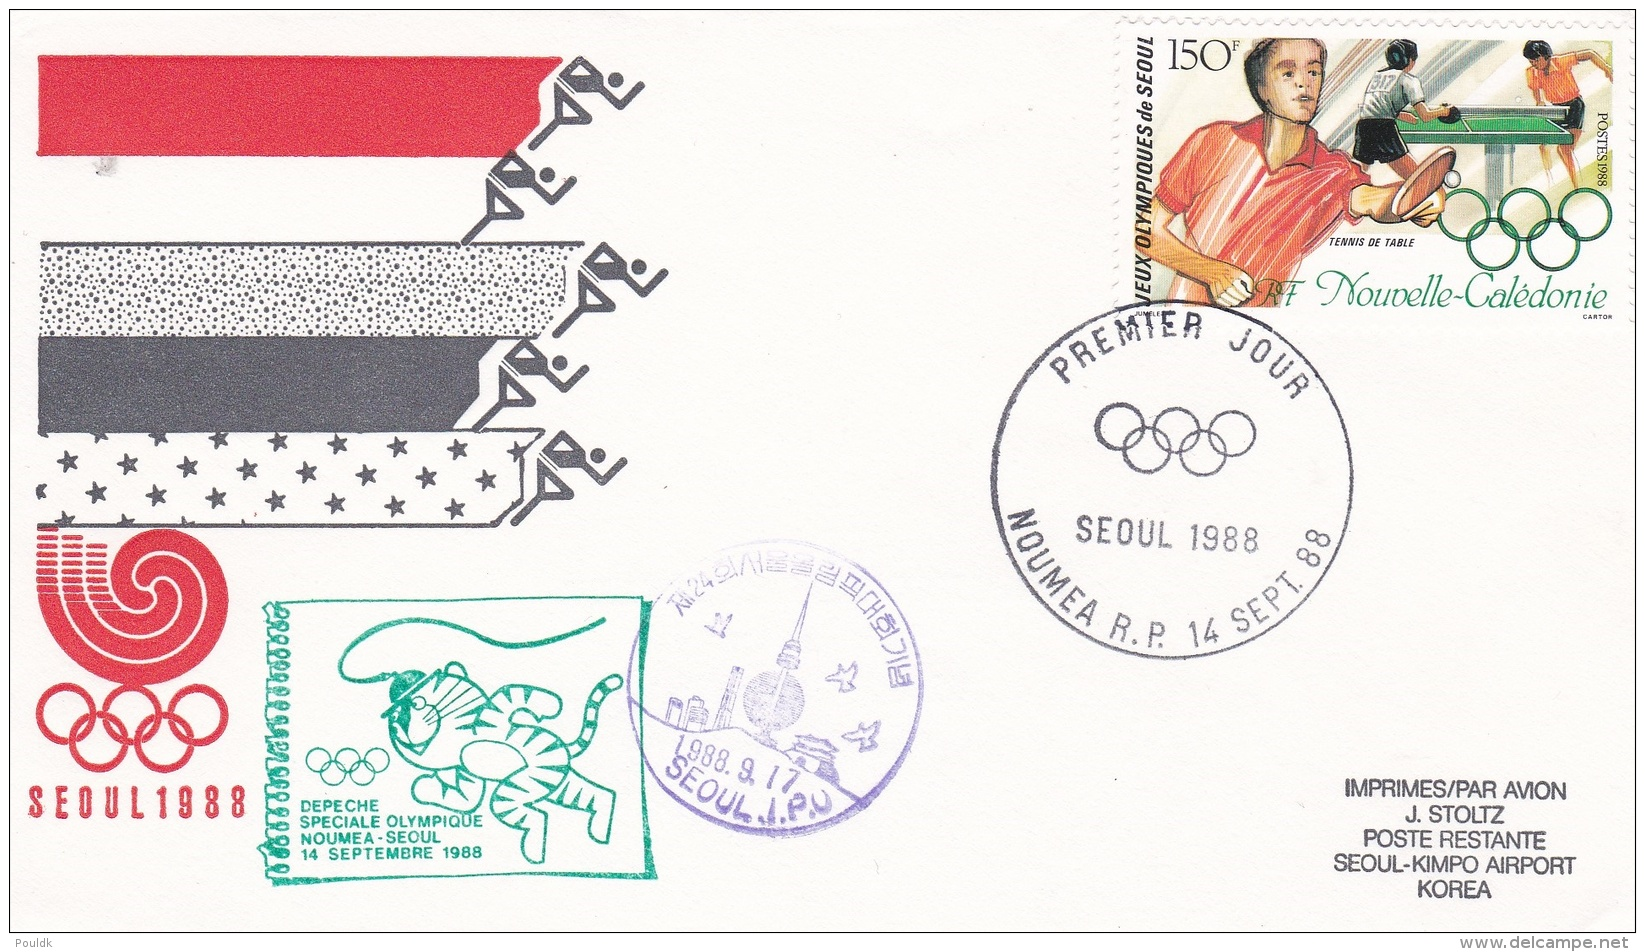 Nouvelle-Caledonie Flight Cover/FDC 1988 Seoul Depeche Speciale Olympique  (DD7-5) - Estate 1988: Seul